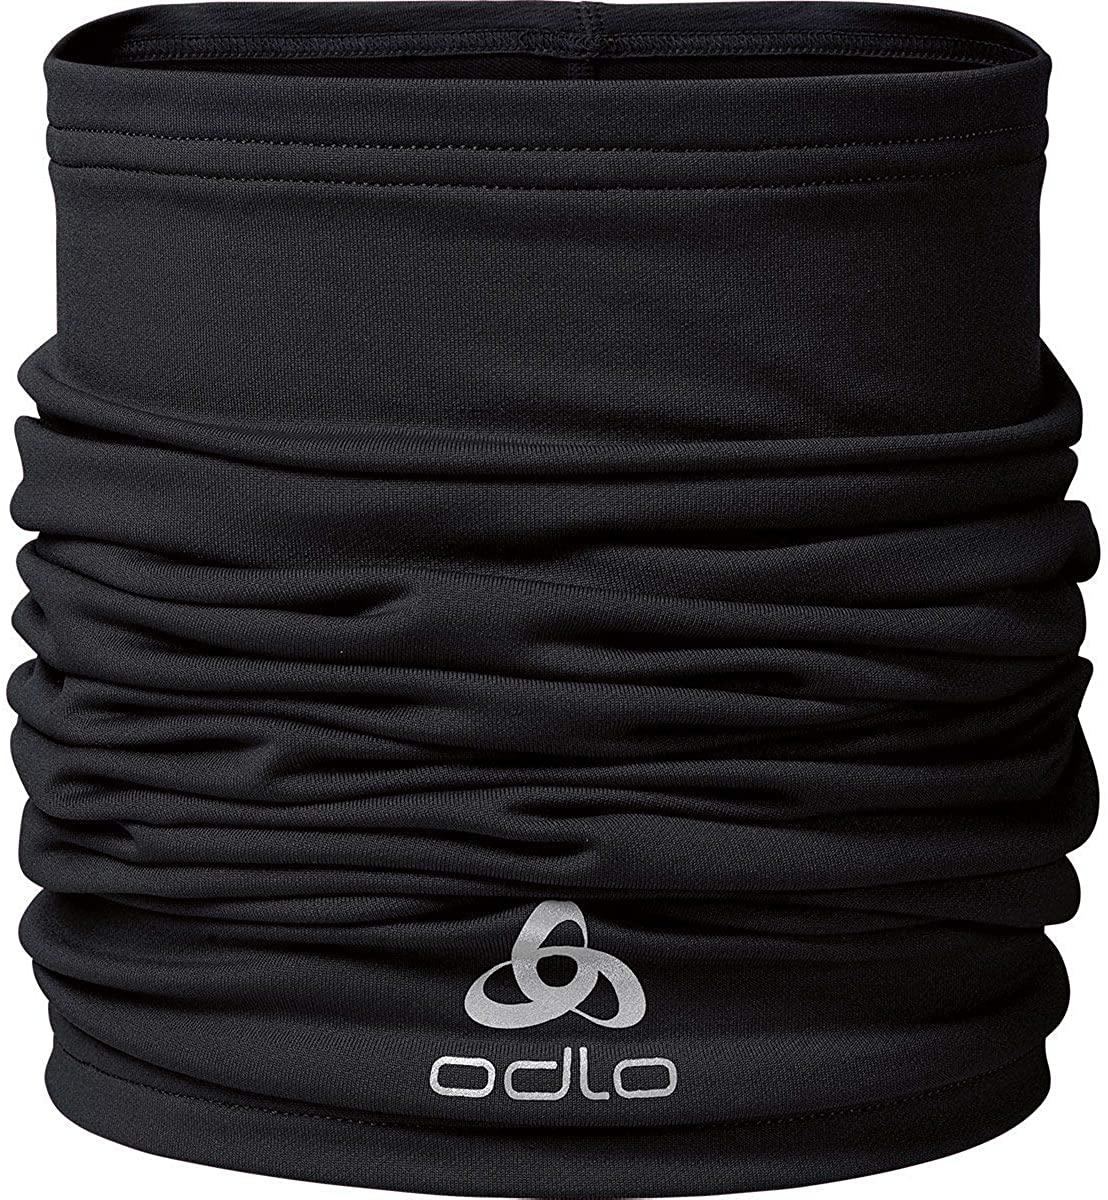 Odlo Tube Ceramiwarm Pro Headwear